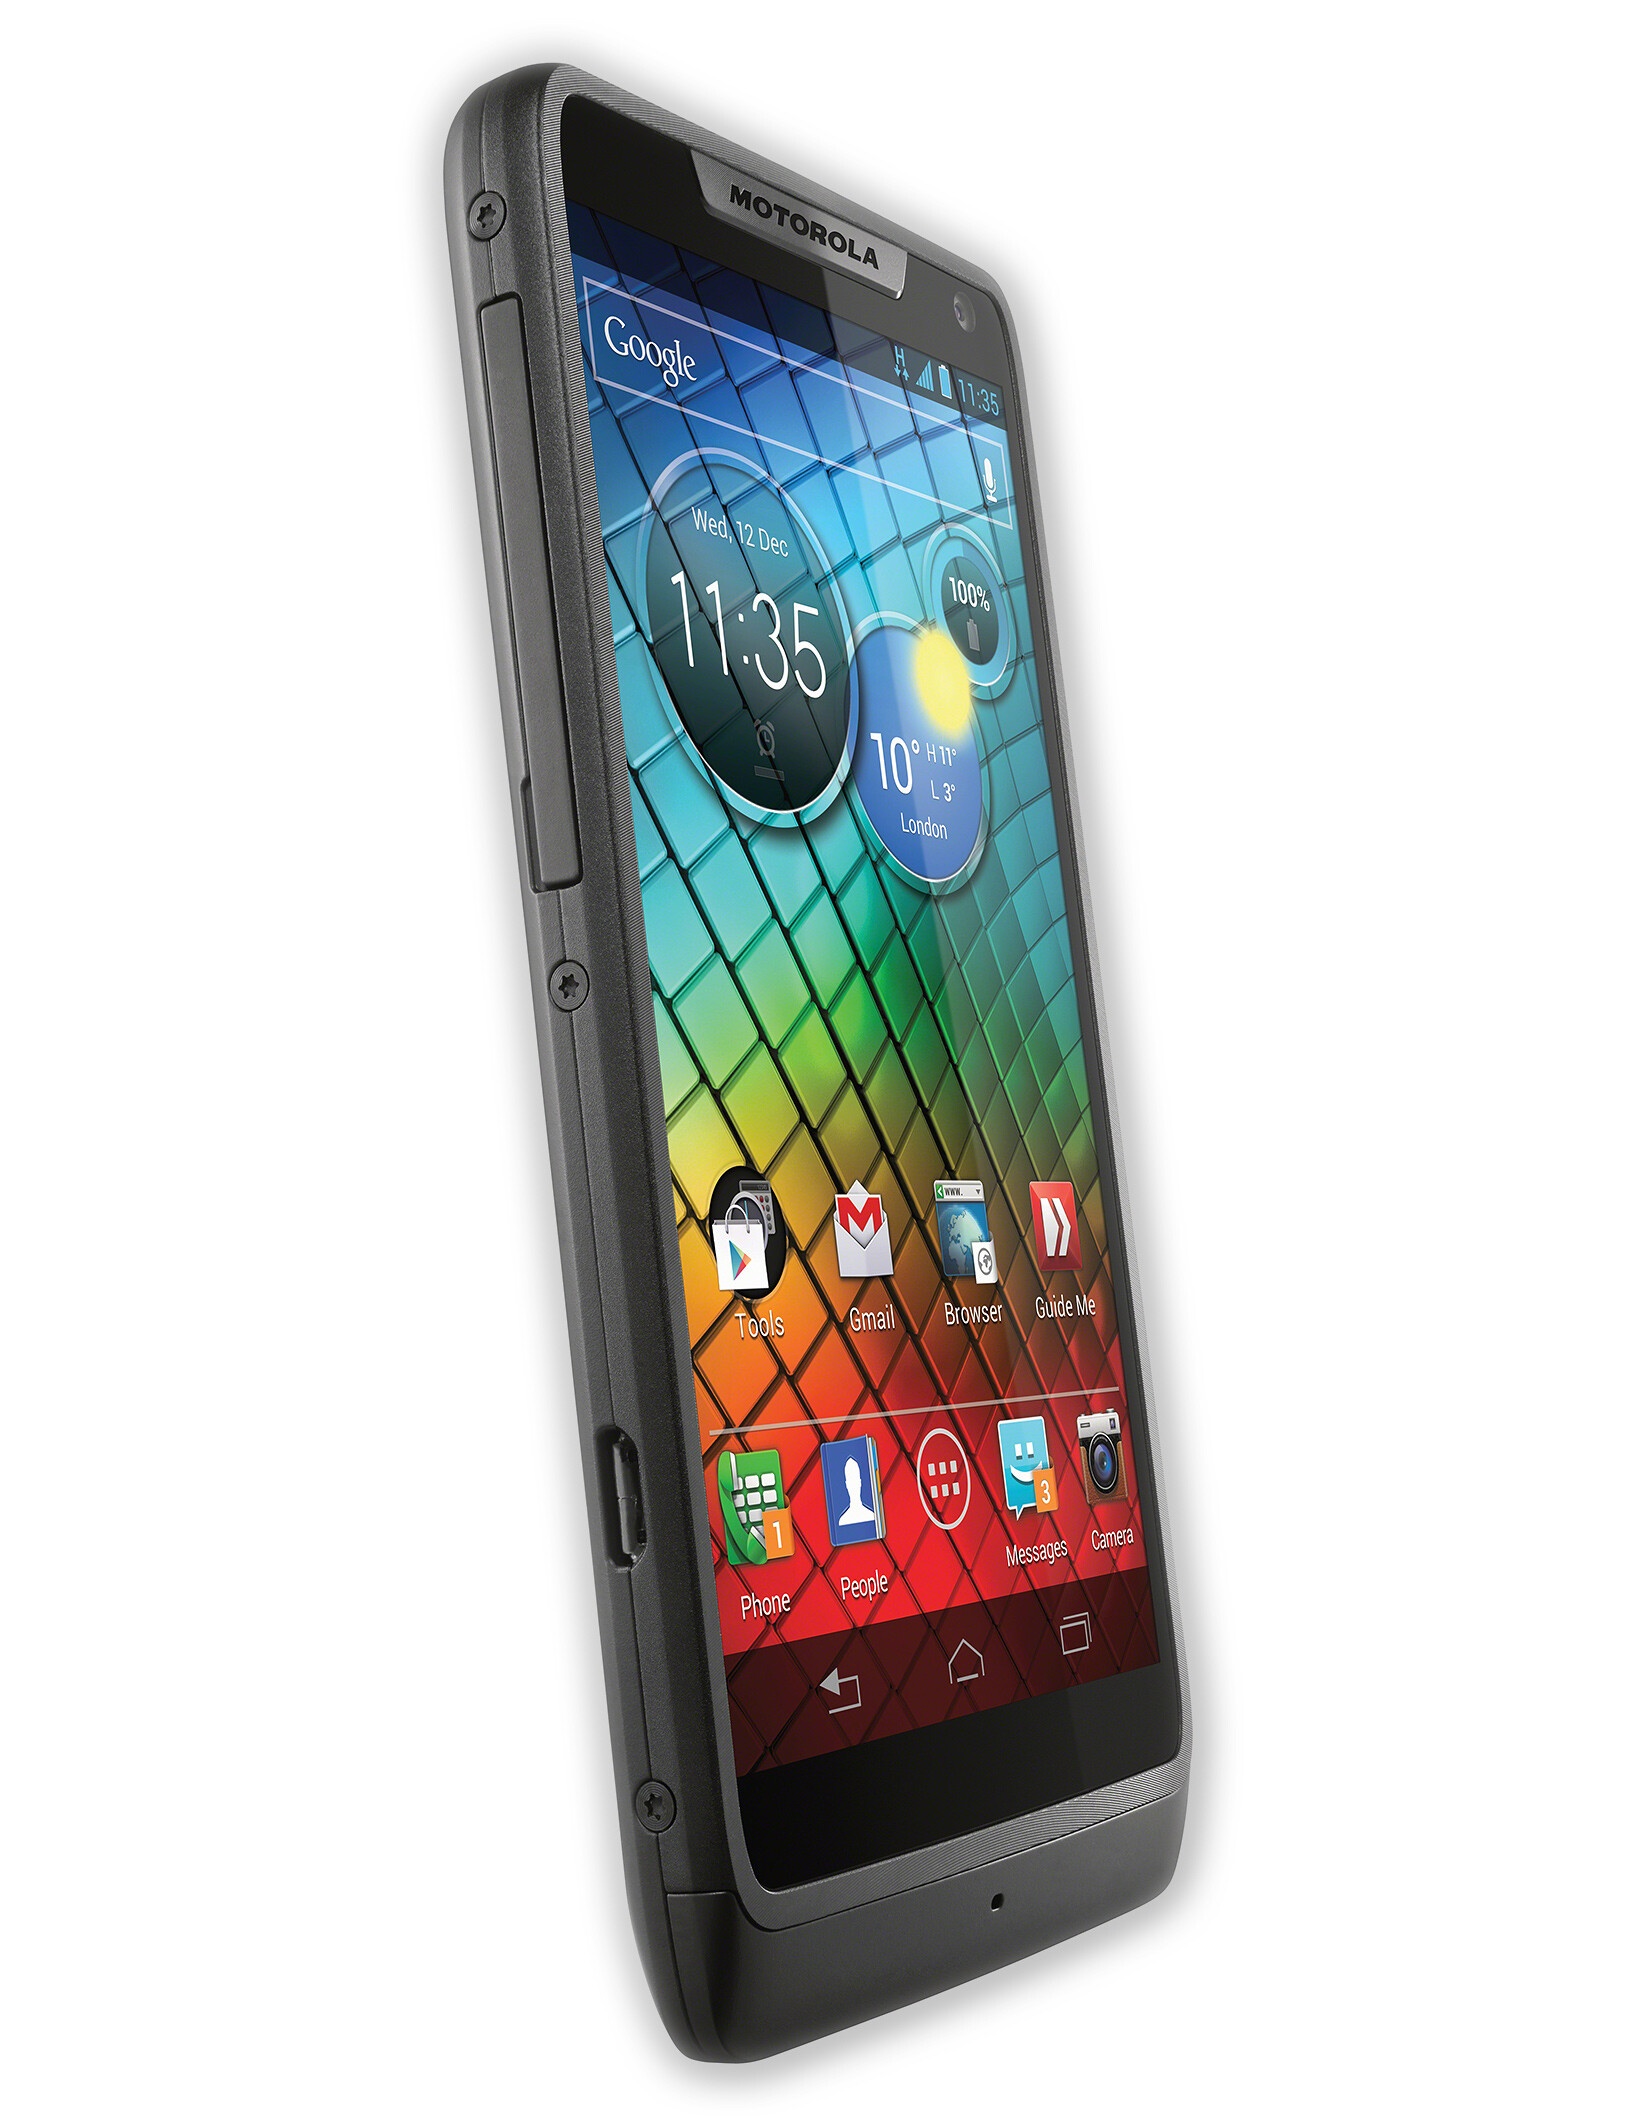 Motorola Razr I Specs